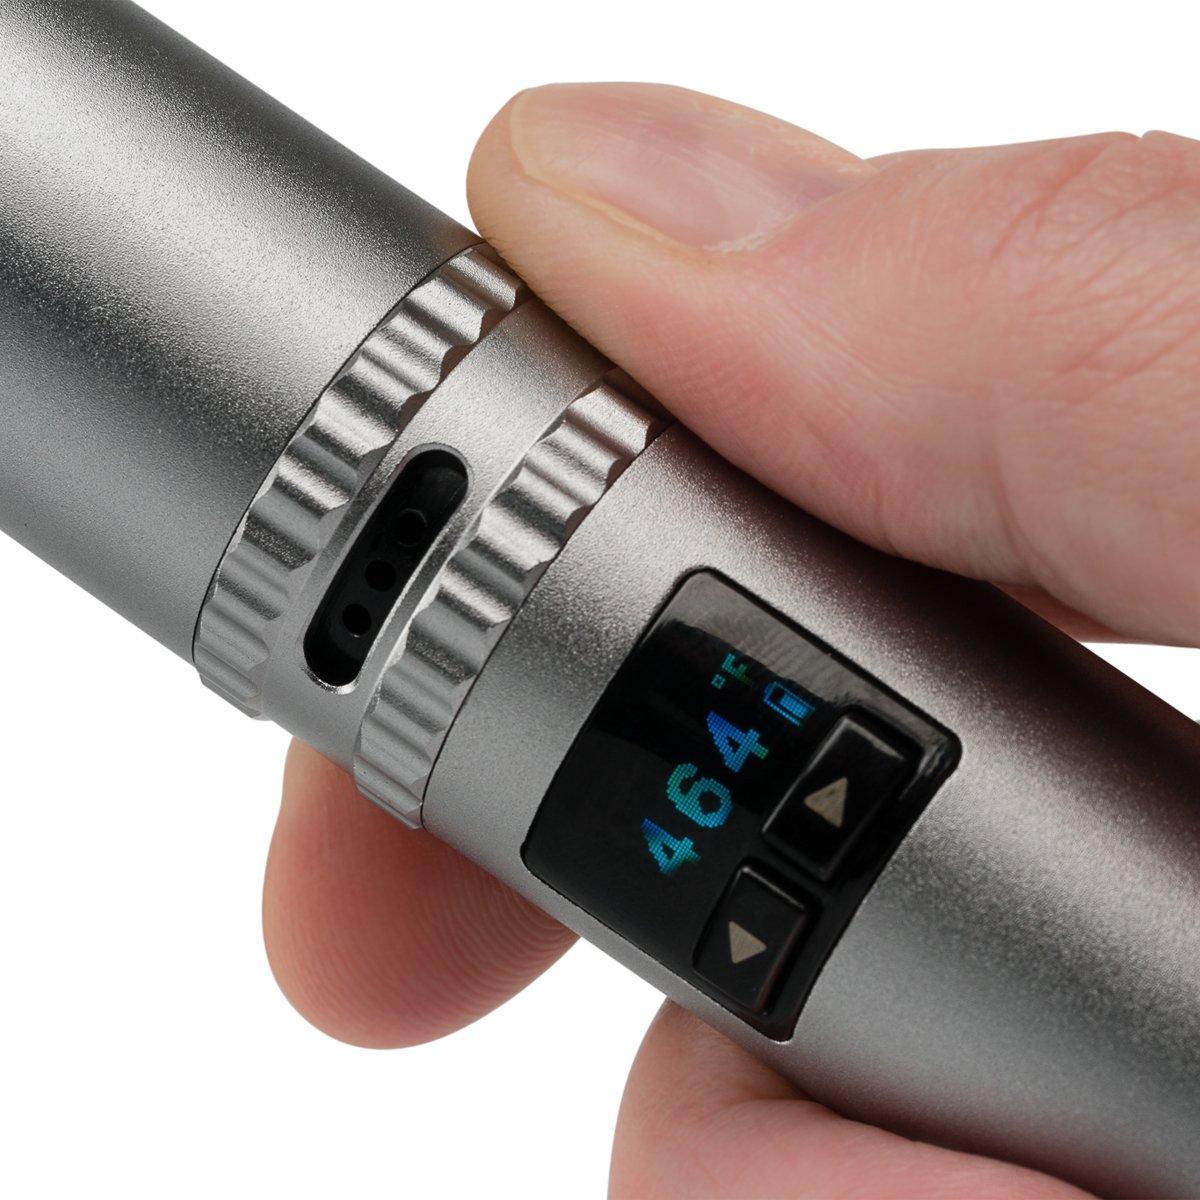 FocusVape Pro S Portable Vaporizer